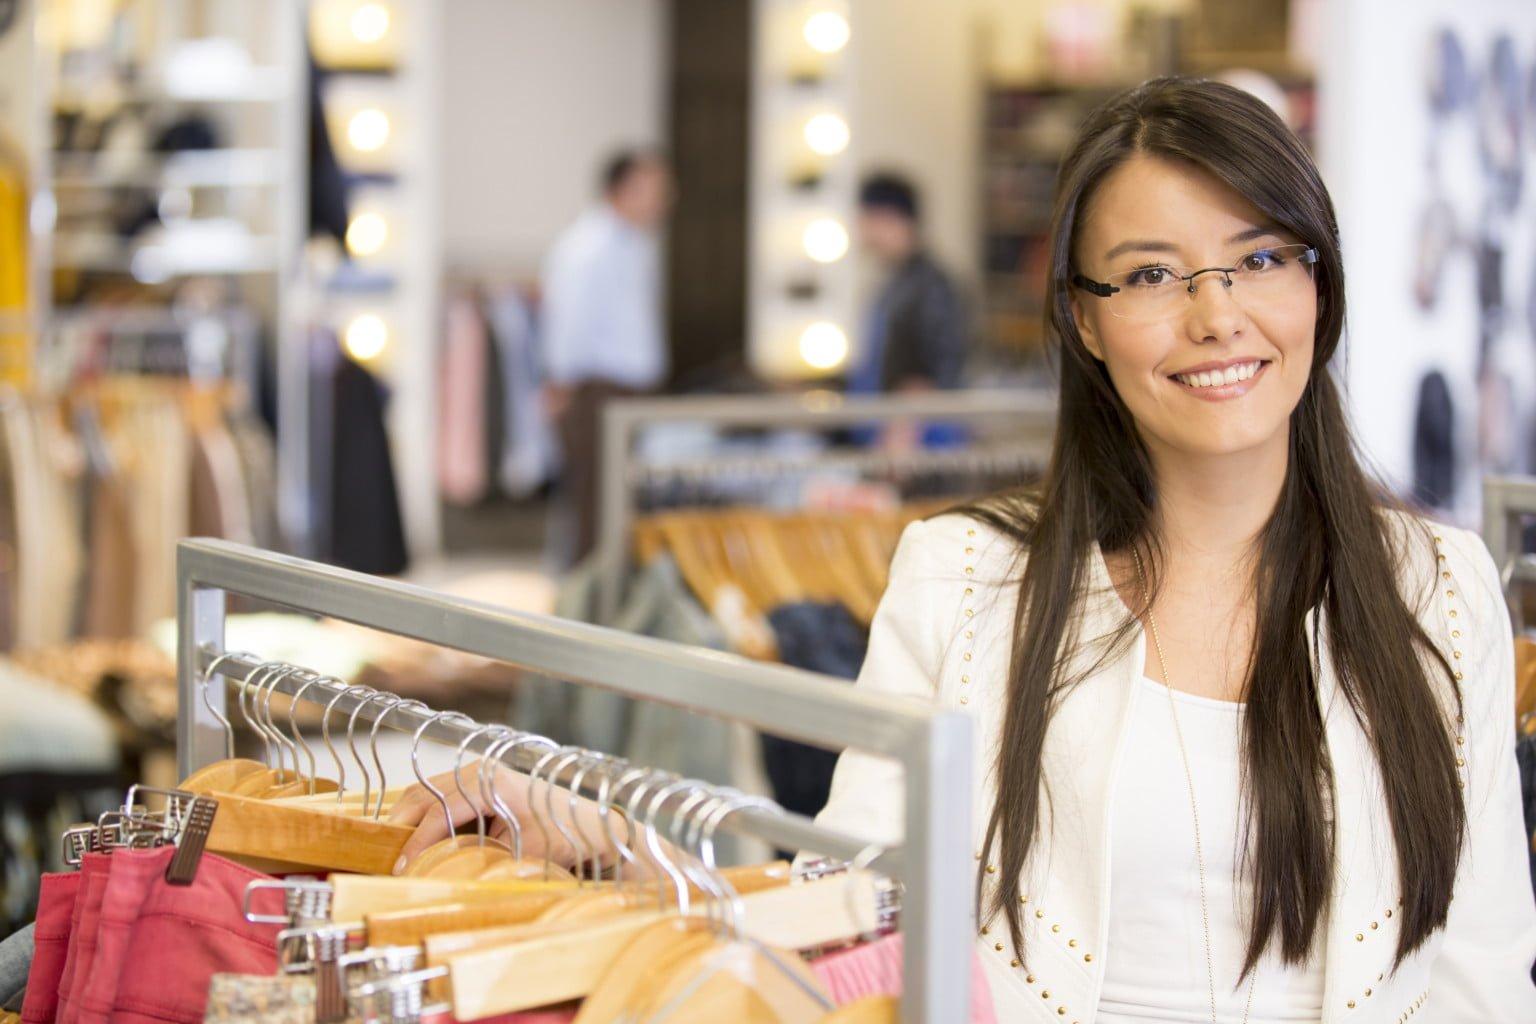 Hiring Temporary Employees? 5 Short Term Hiring Tips